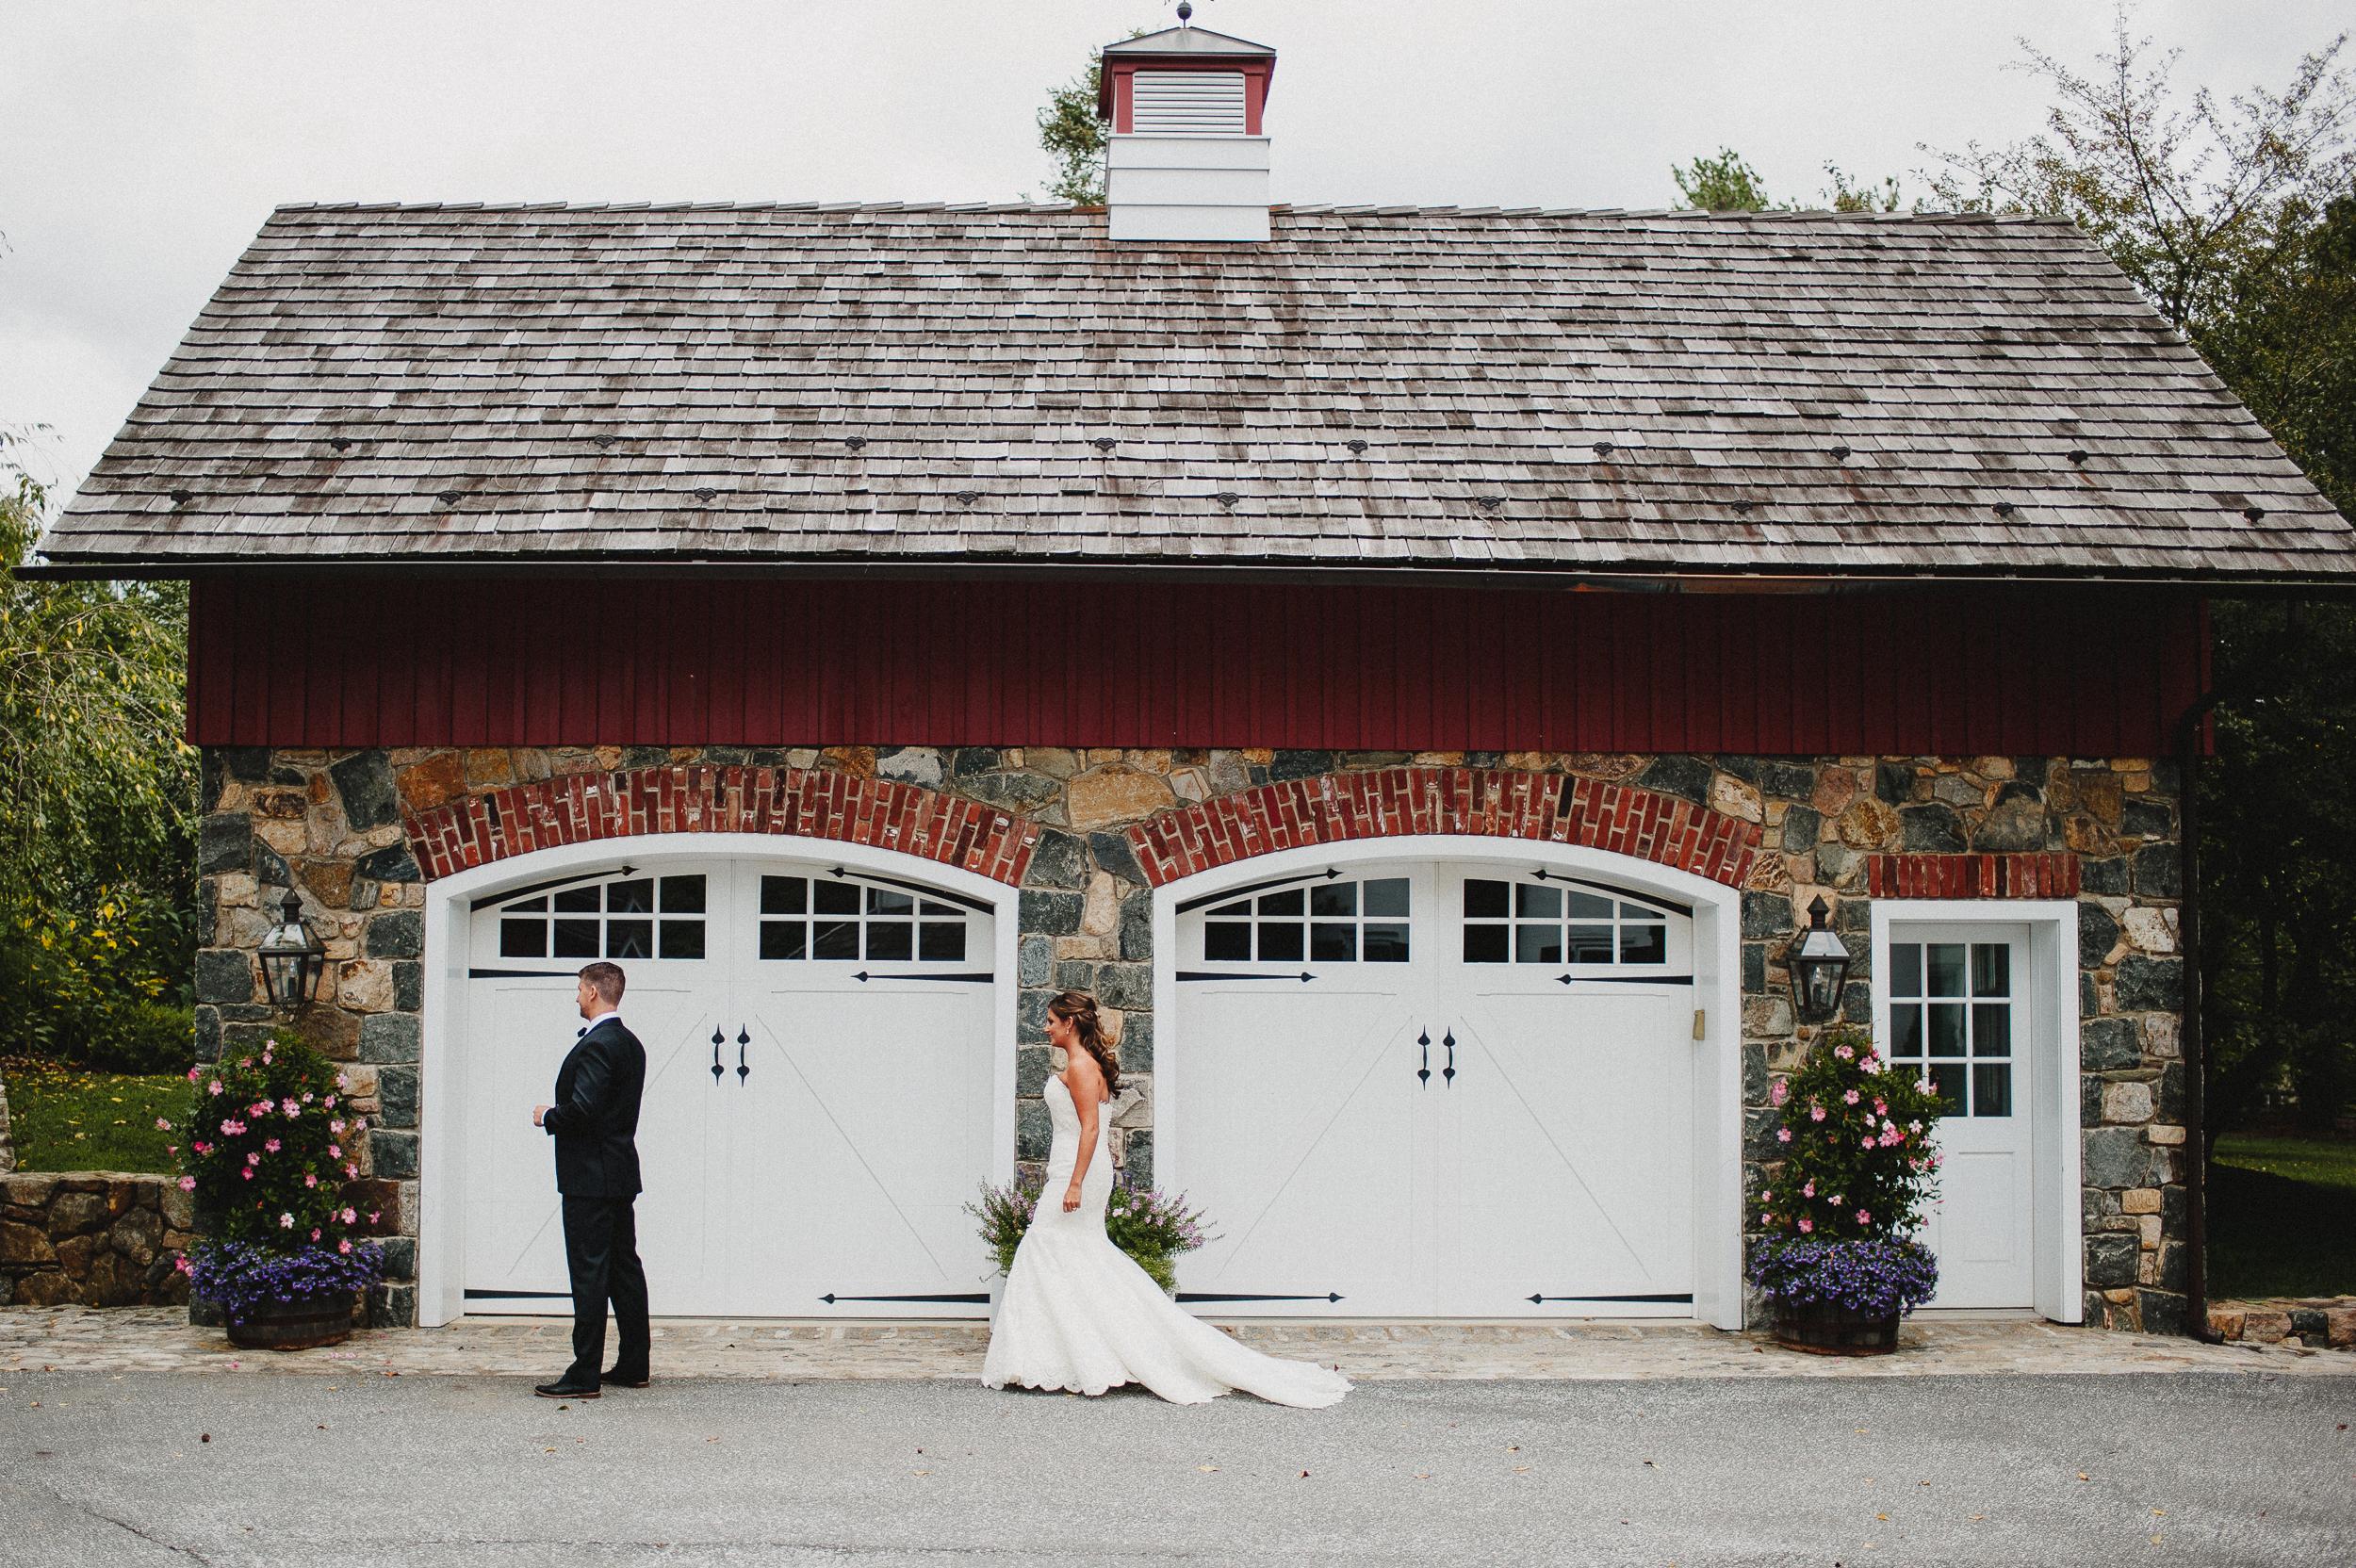 delaware-estate-wedding-photographer-pat-robinson-photography-36.jpg